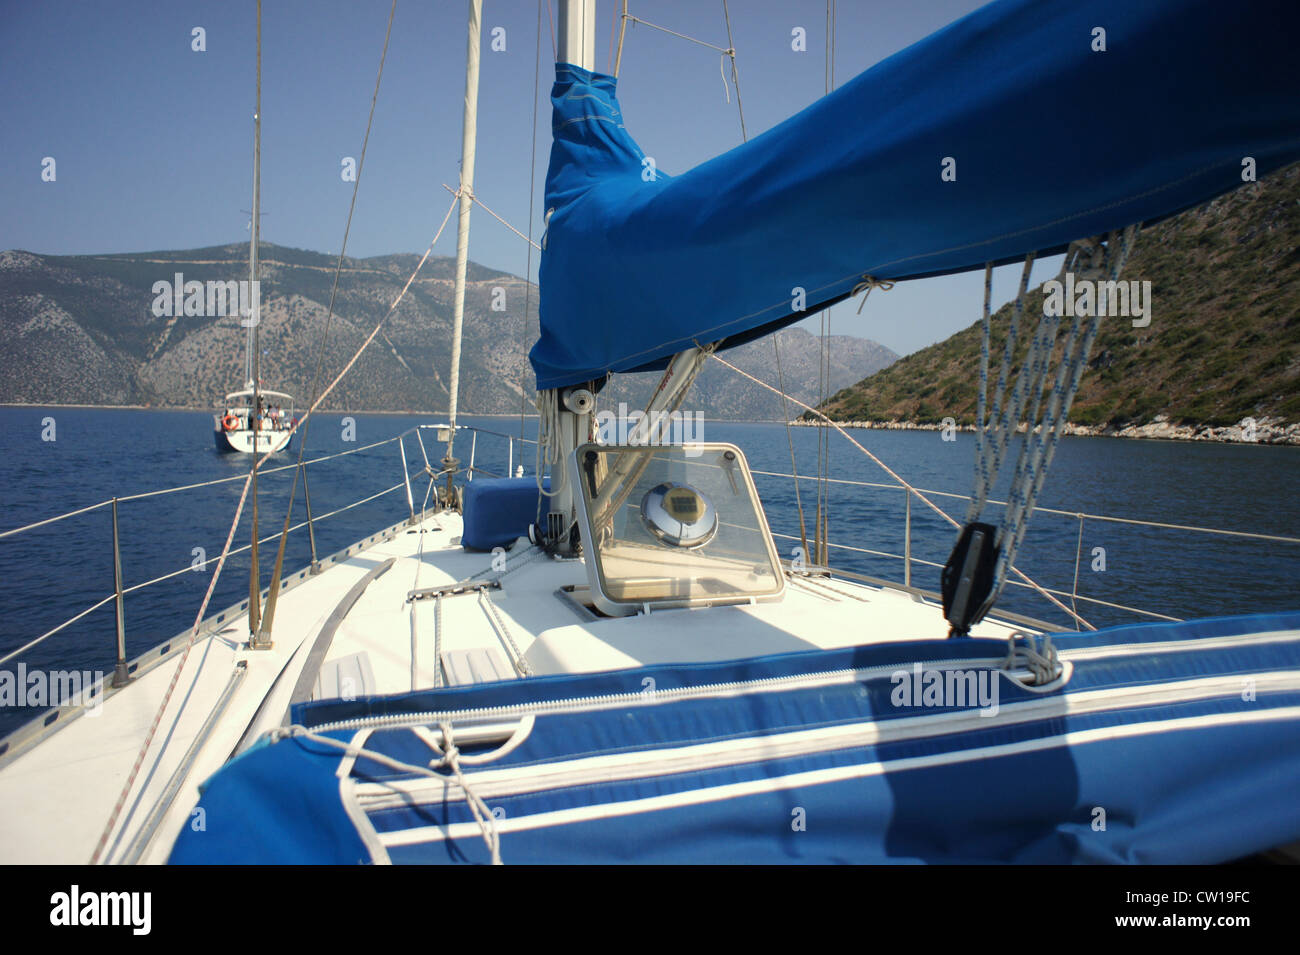 Sailing boats, Ionian Islands, Greece - Stock Image